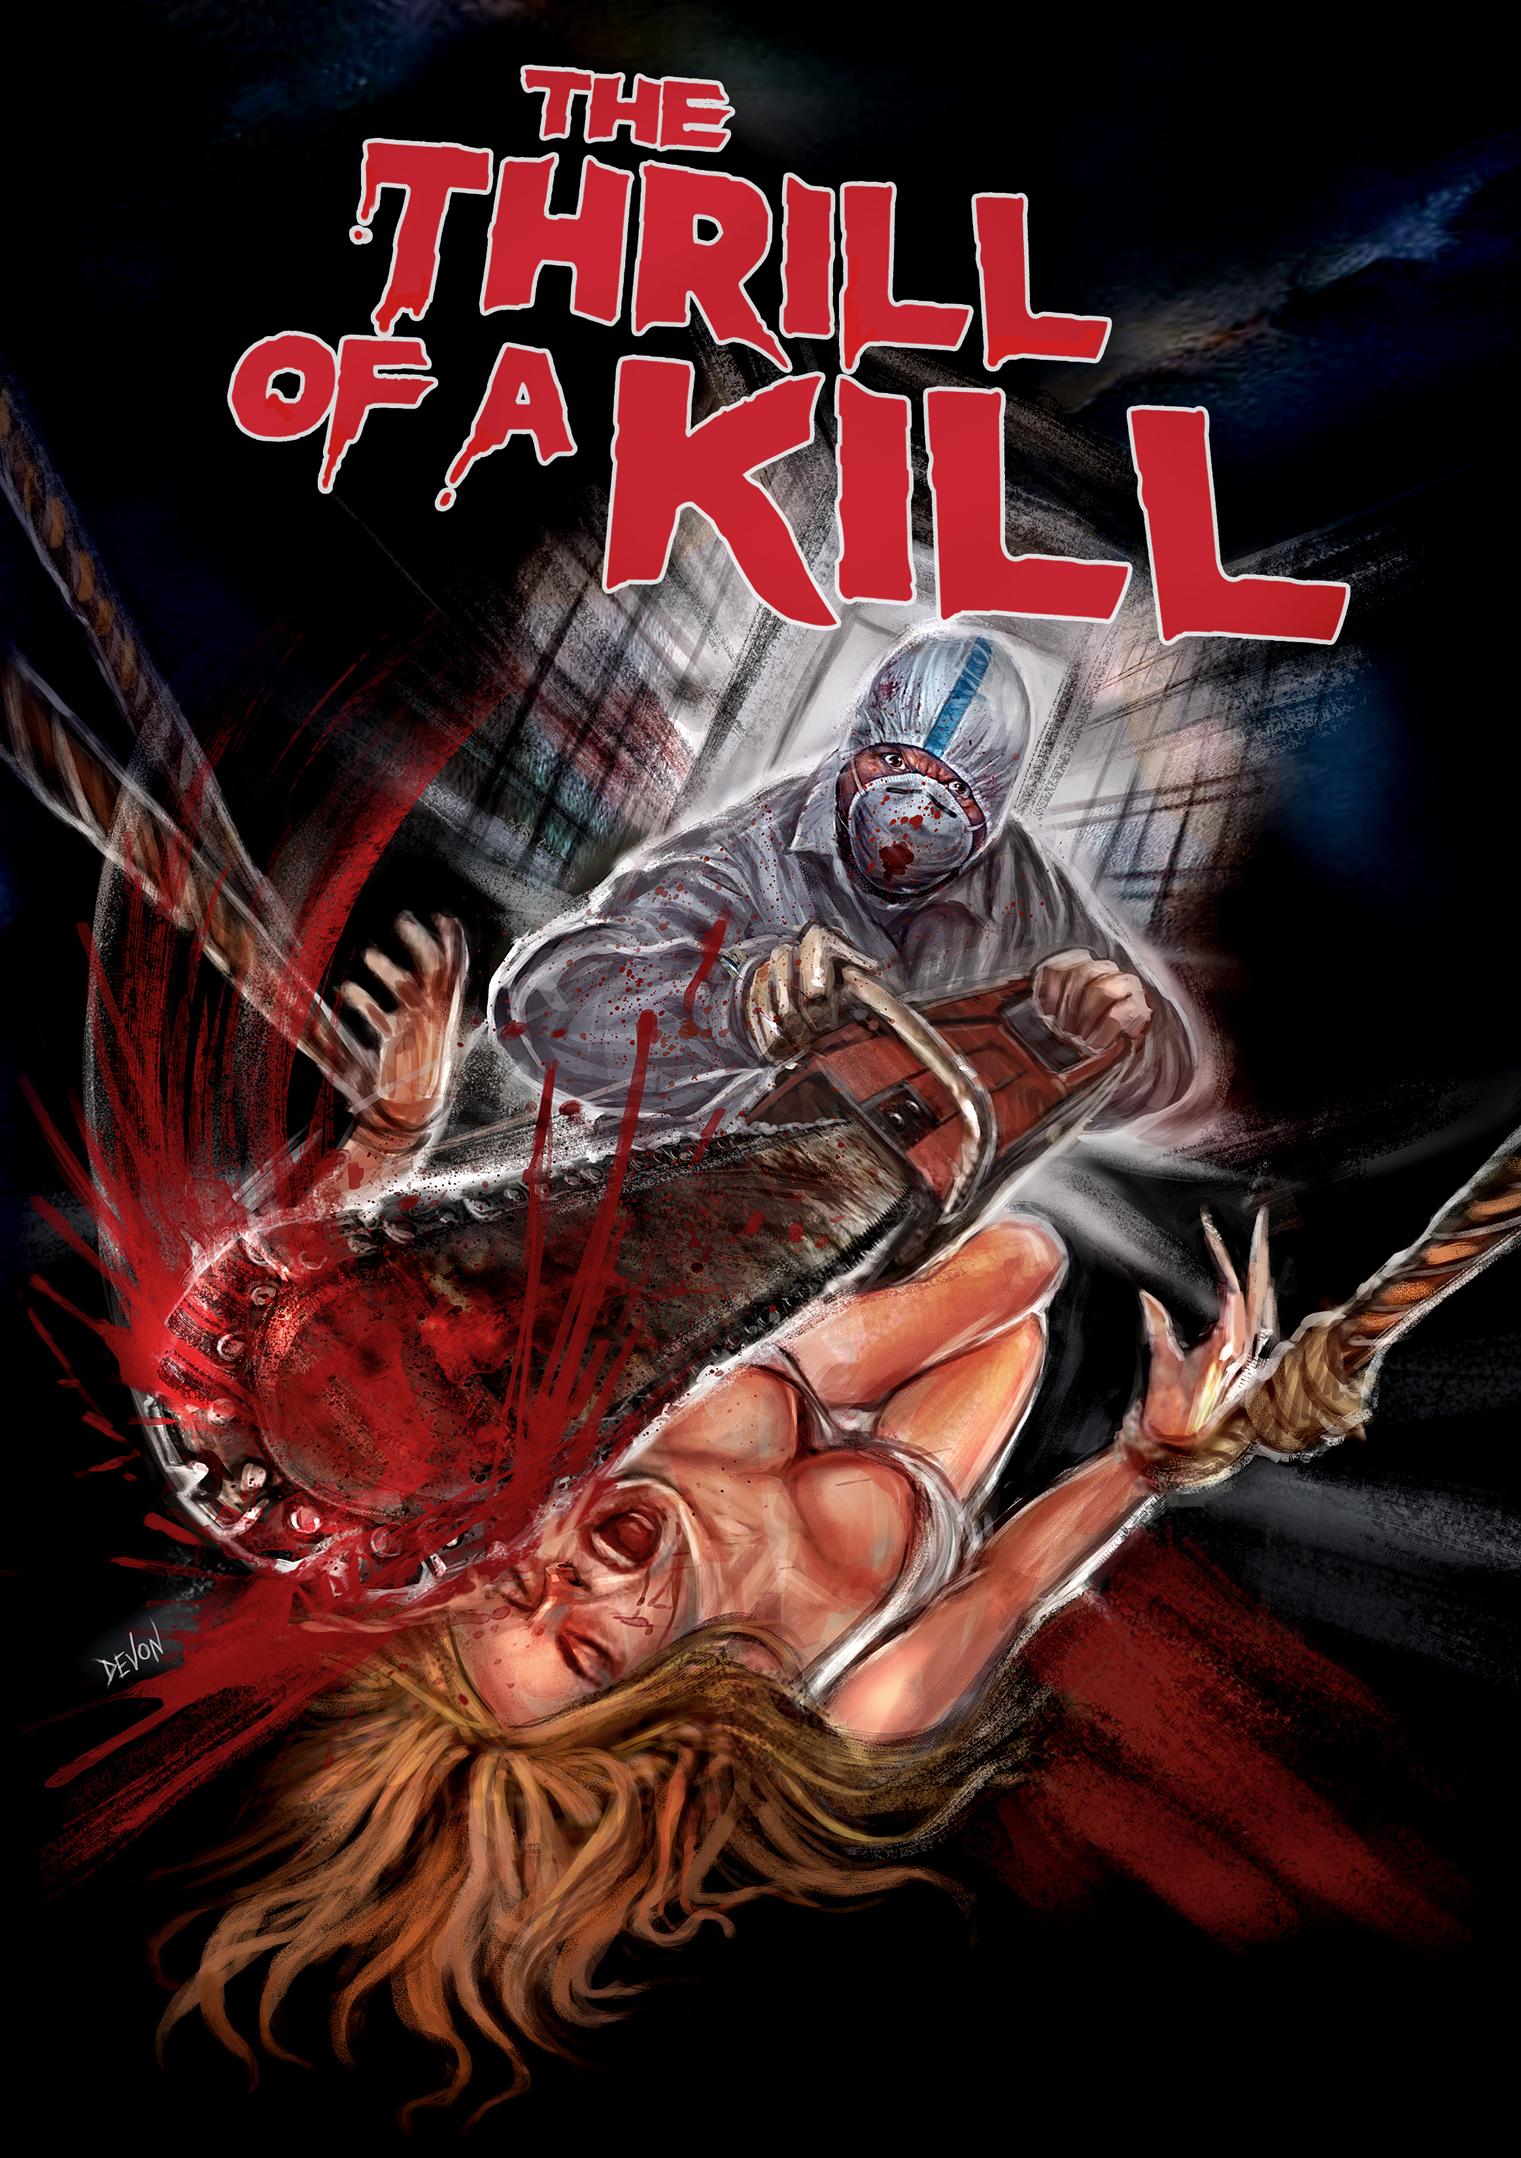 The Thrill of a Kill